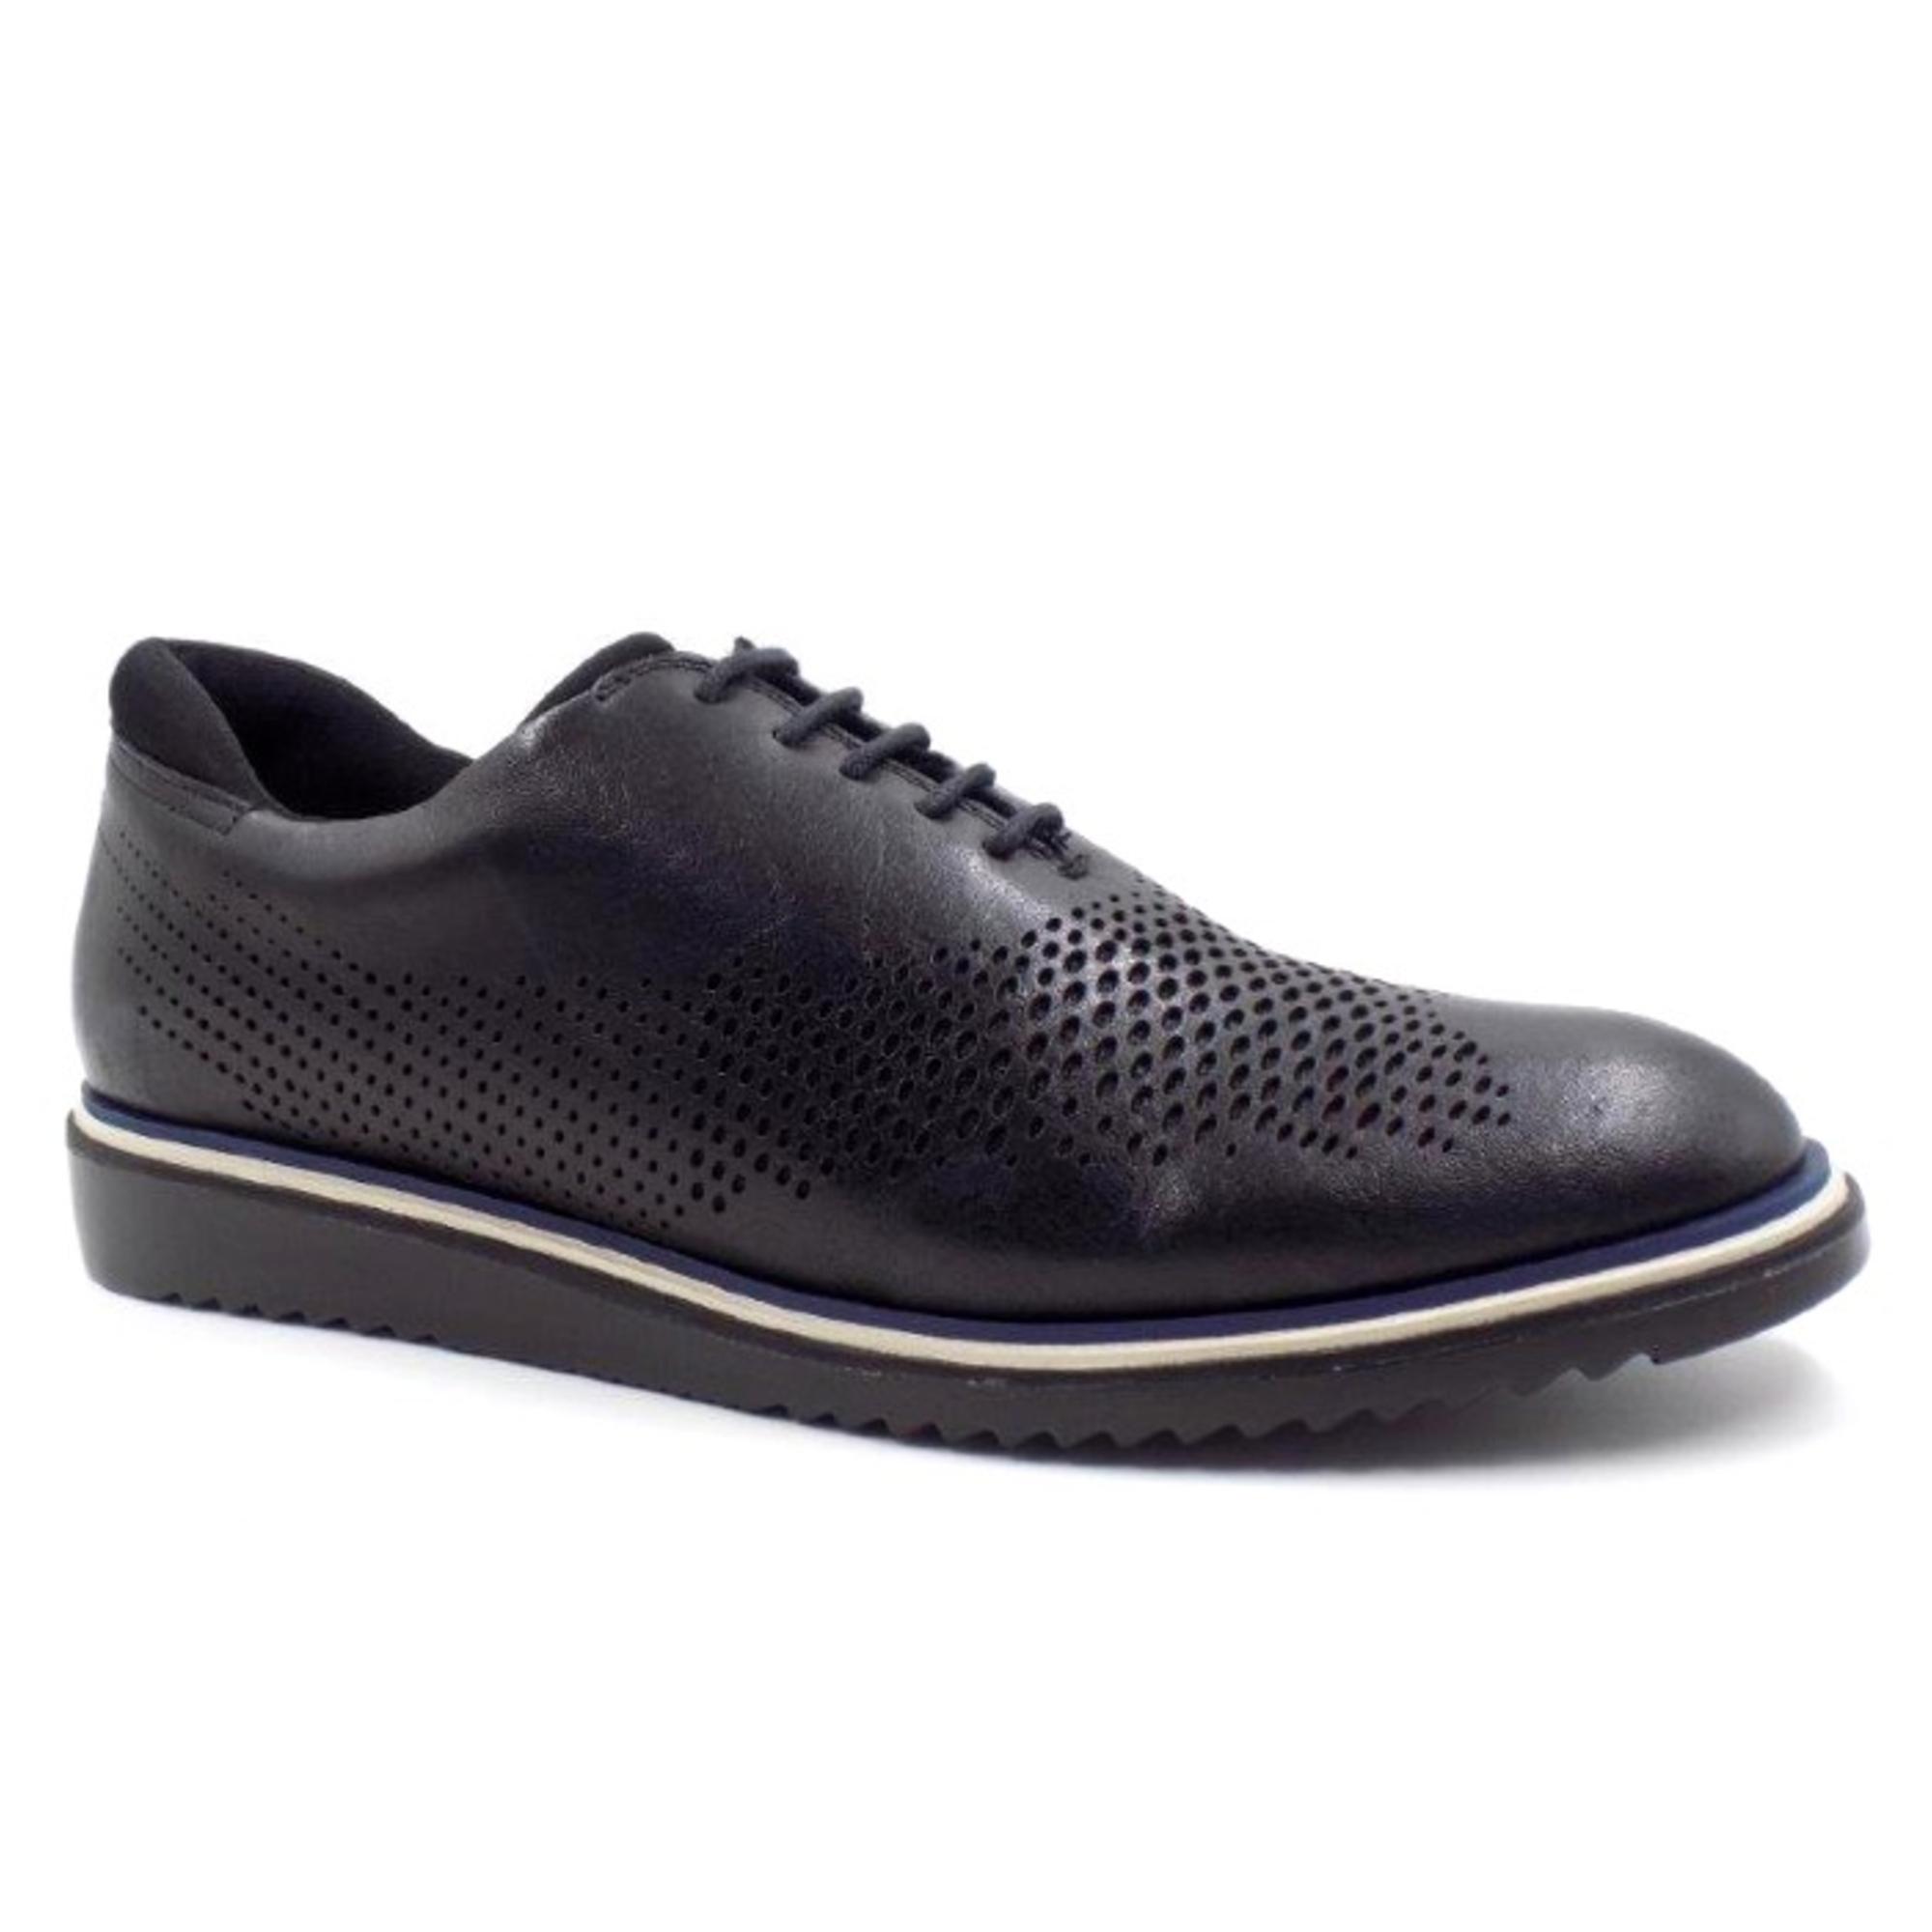 Sapato Casual Couro Sola Borracha 606033